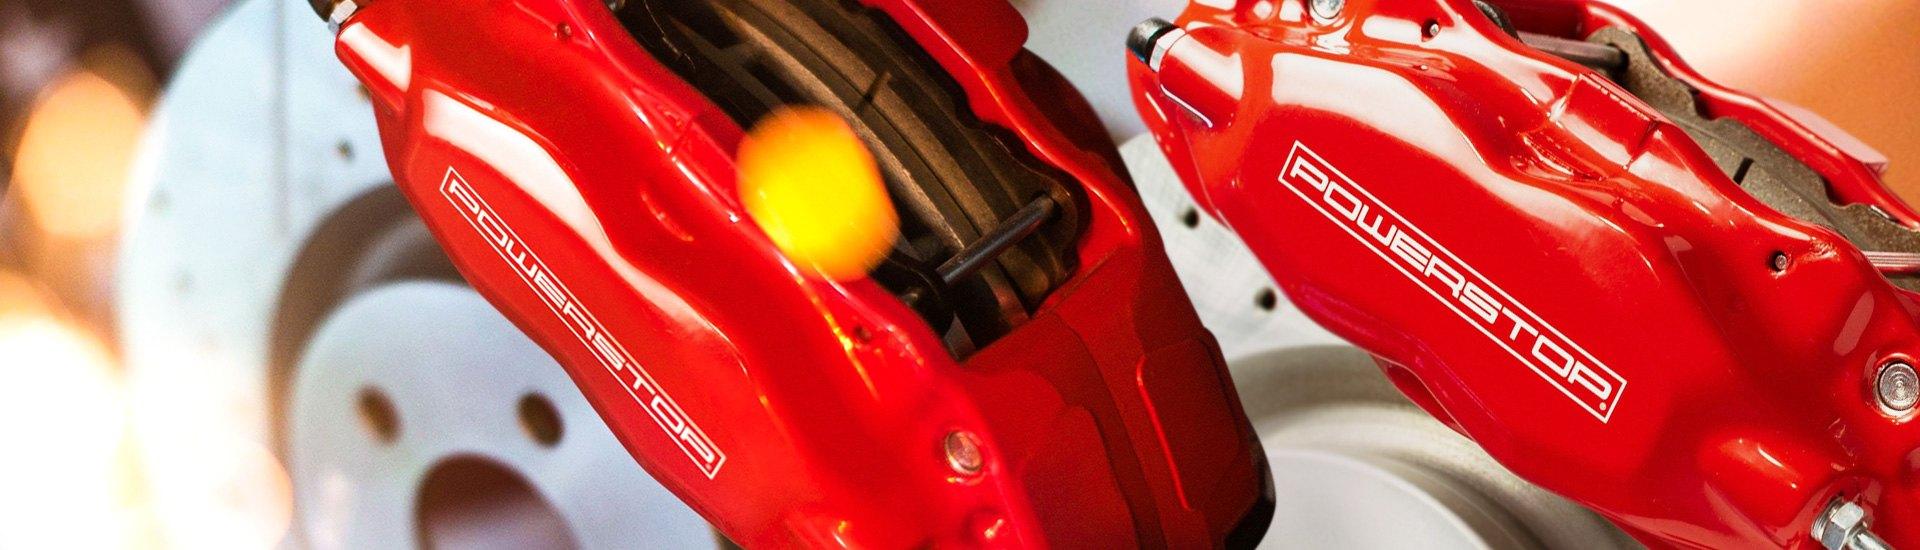 Performance Brakes | Kits, Pads, Rotors, Calipers – CARiD com